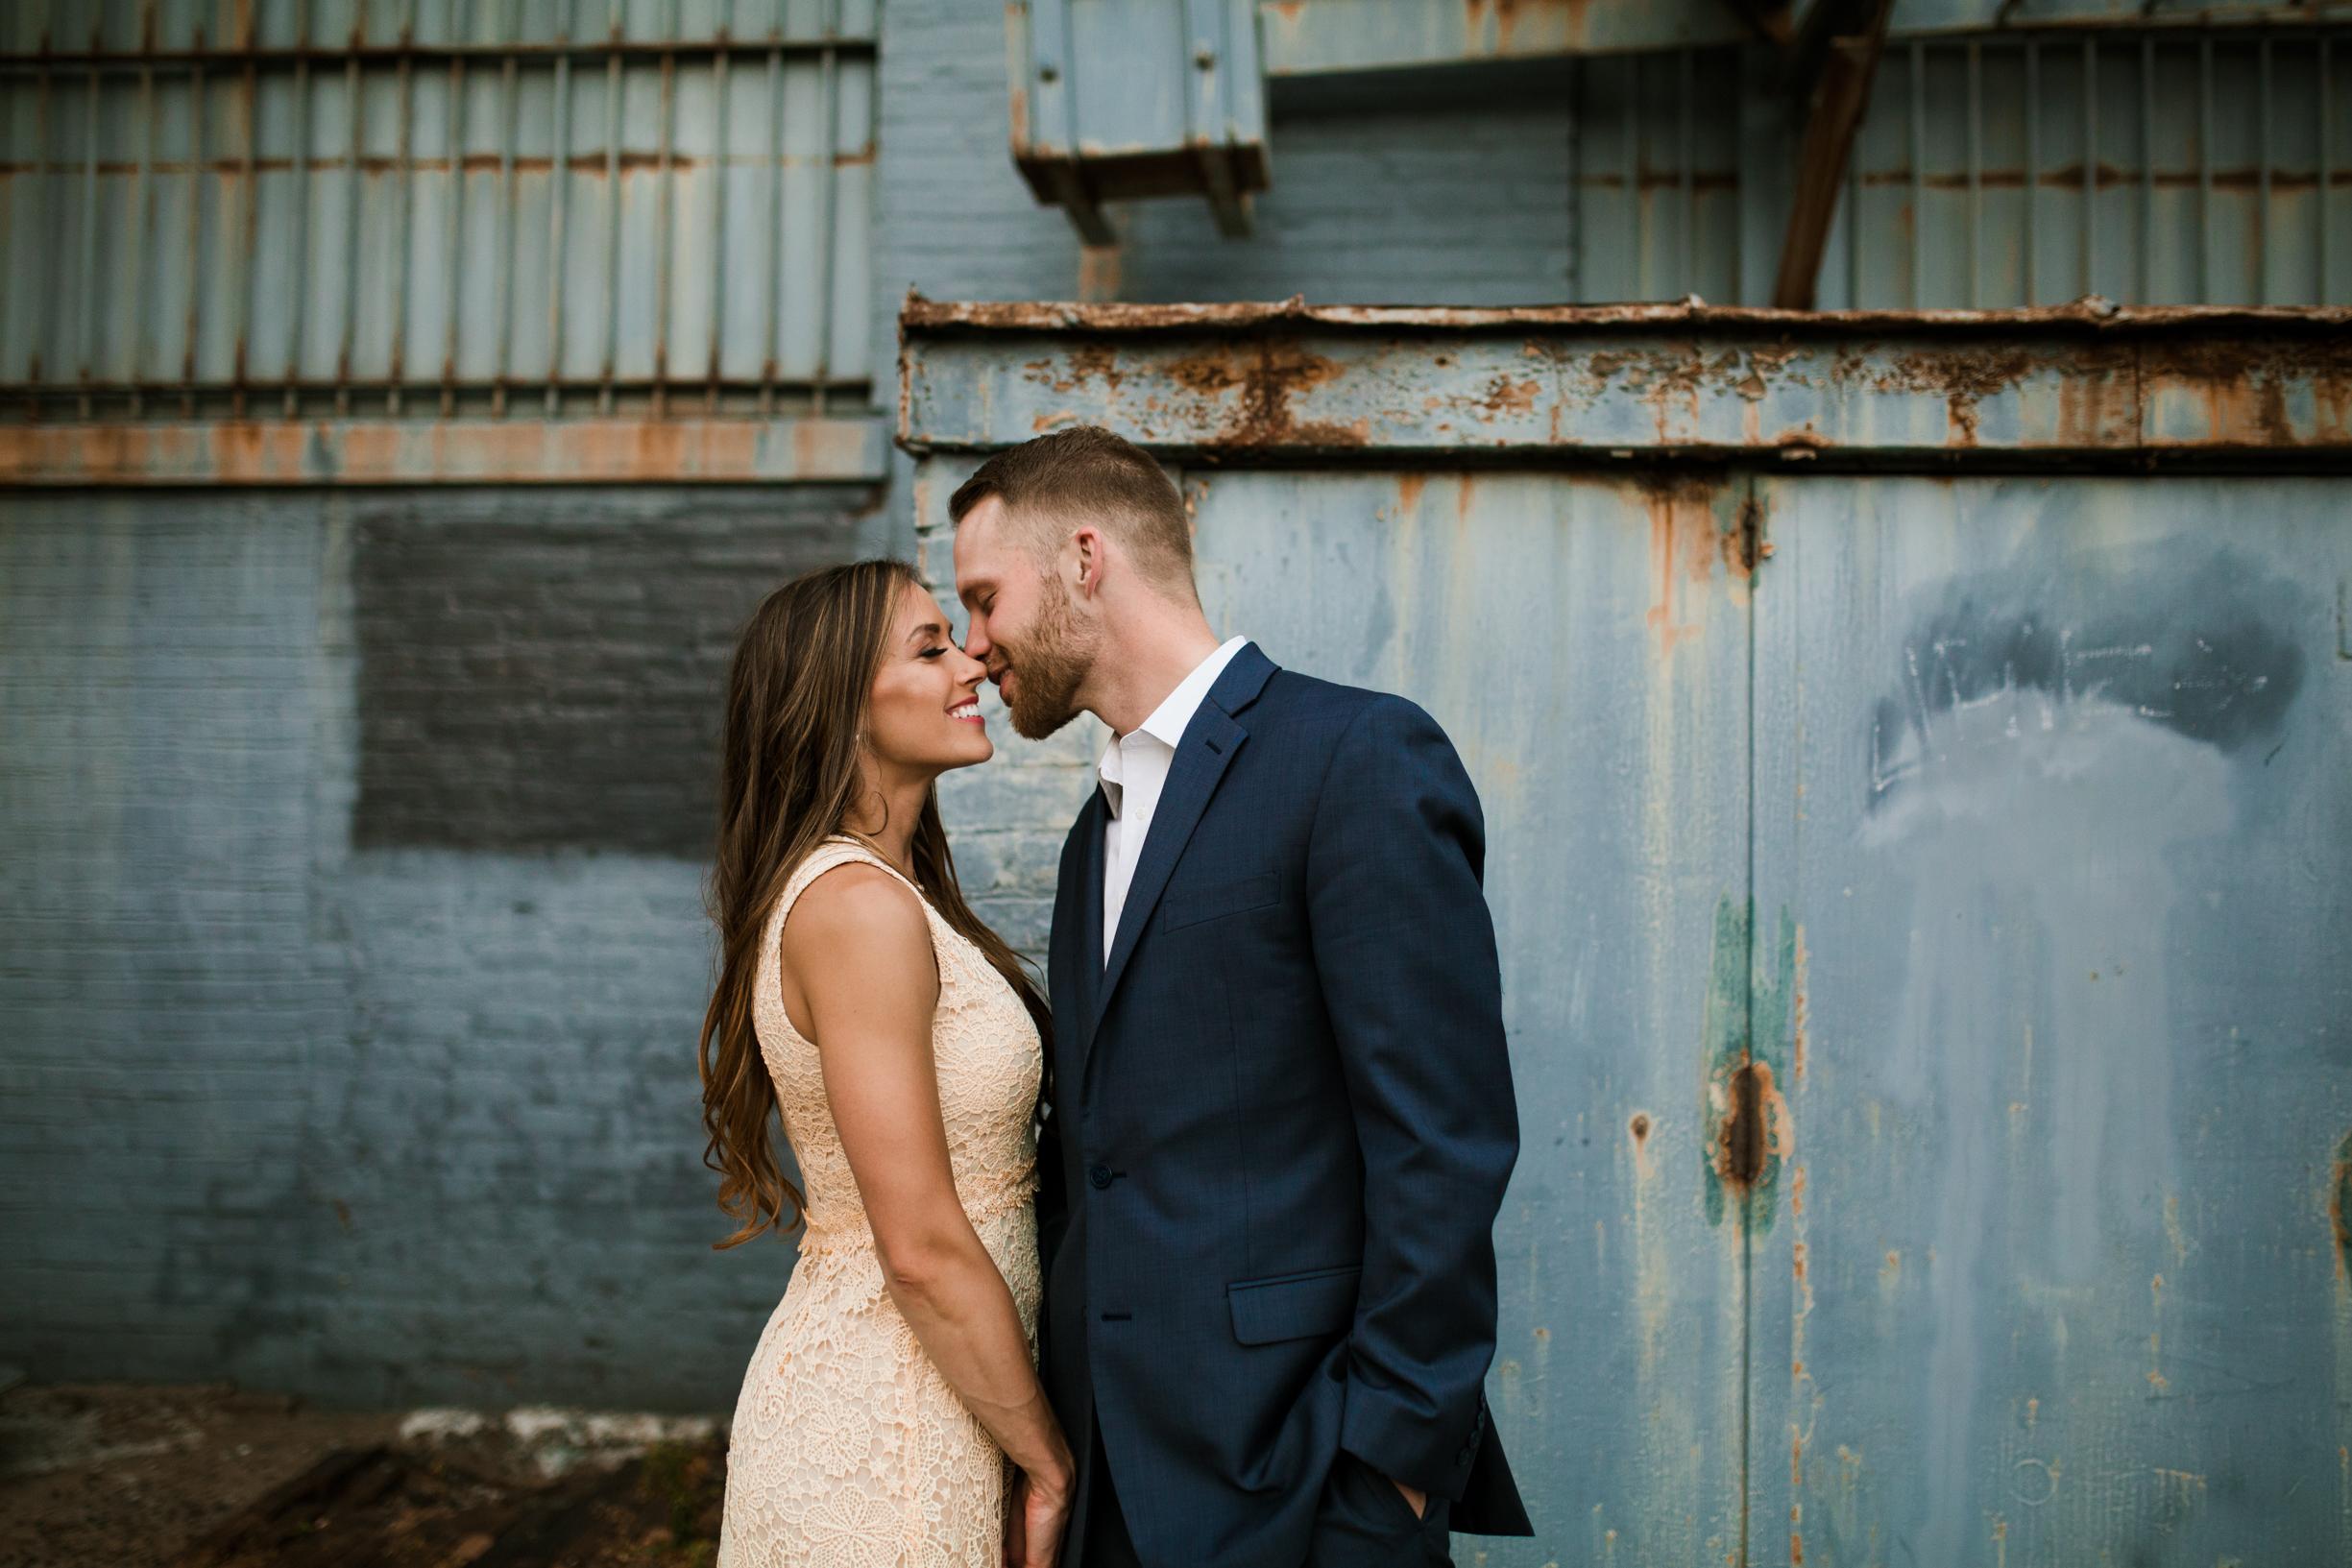 Victoria & Chad Engagement 2018 Crystal Ludwick Photo Louisville Kentucky Wedding Photographer WEBSITE (2 of 48).jpg